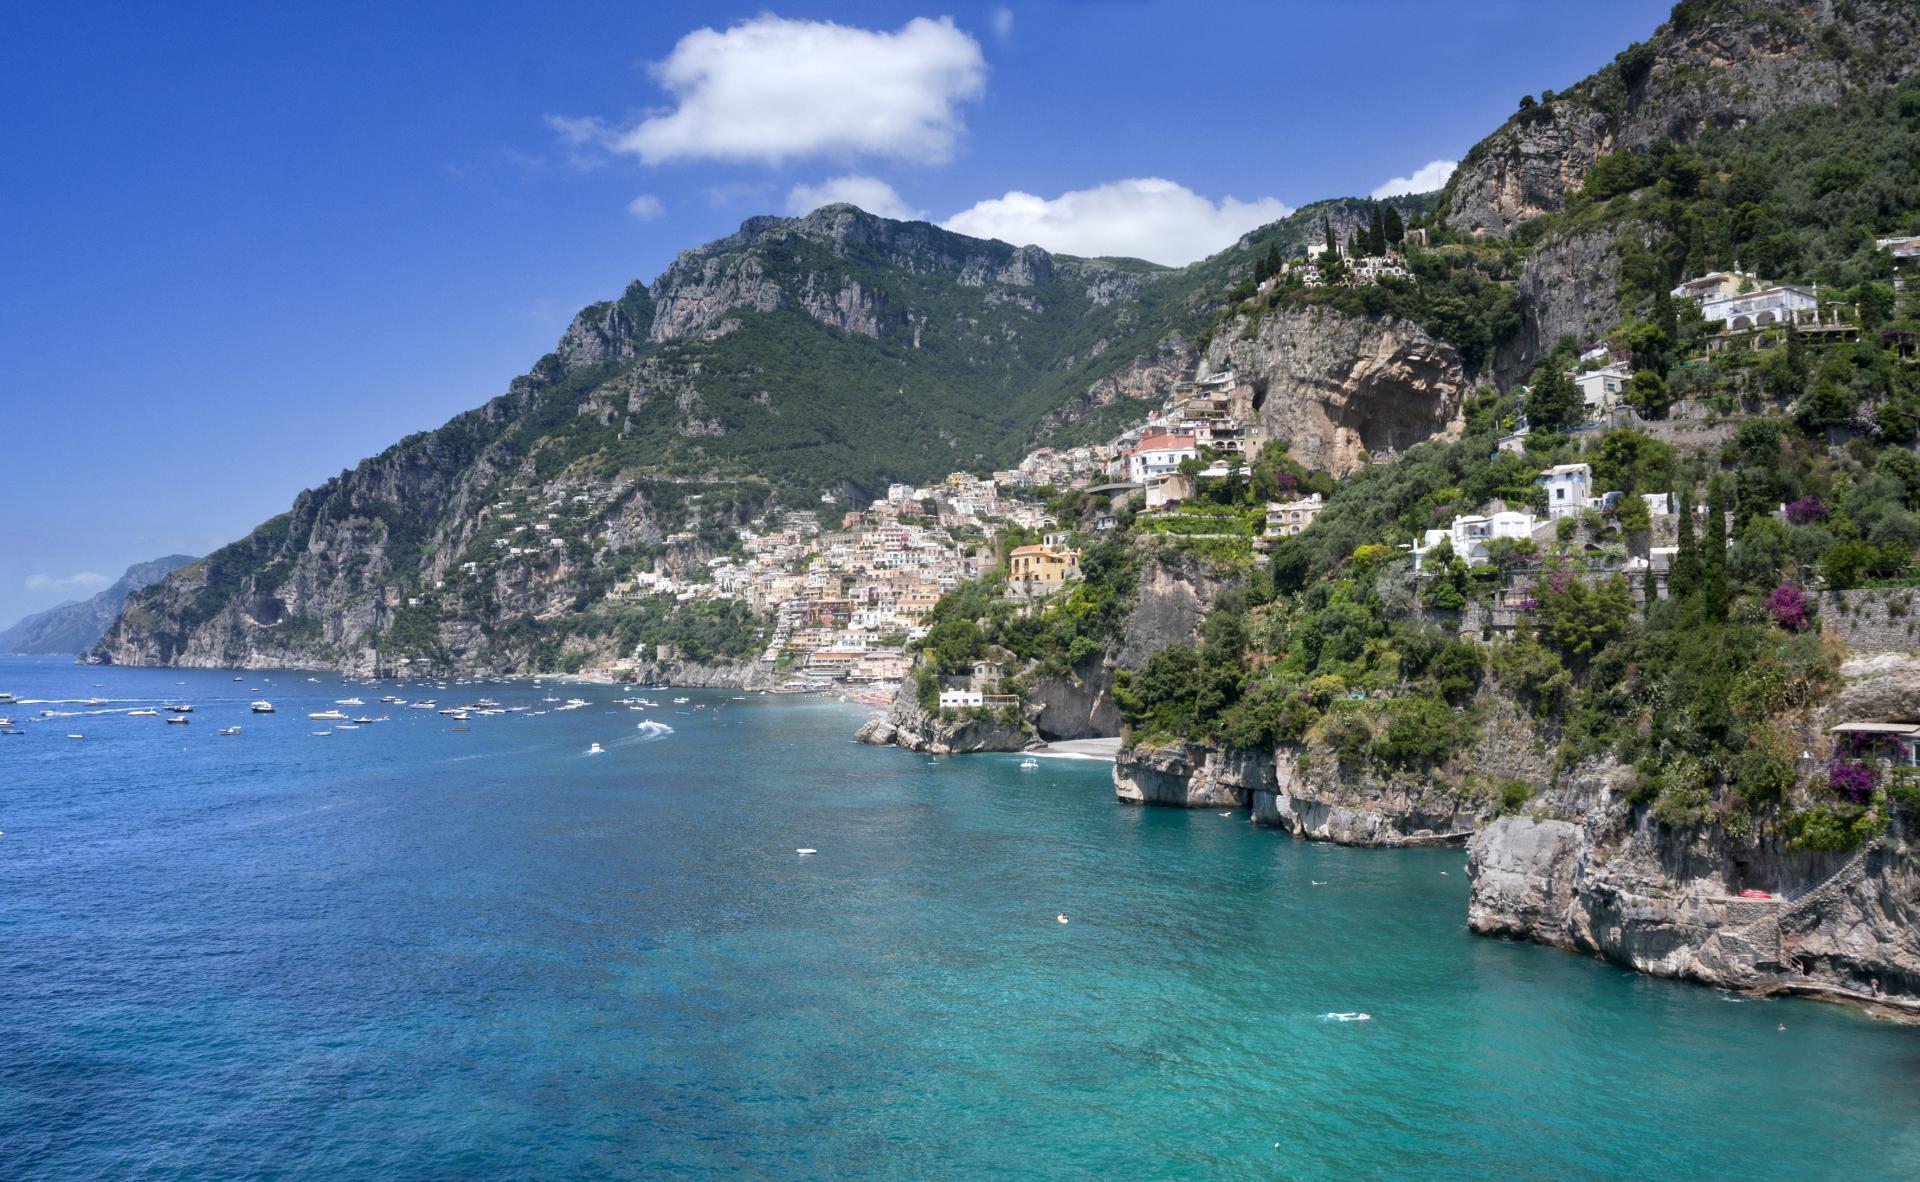 Villa Sea Views, La Divina, Positano, Amalfi Coast Campania.